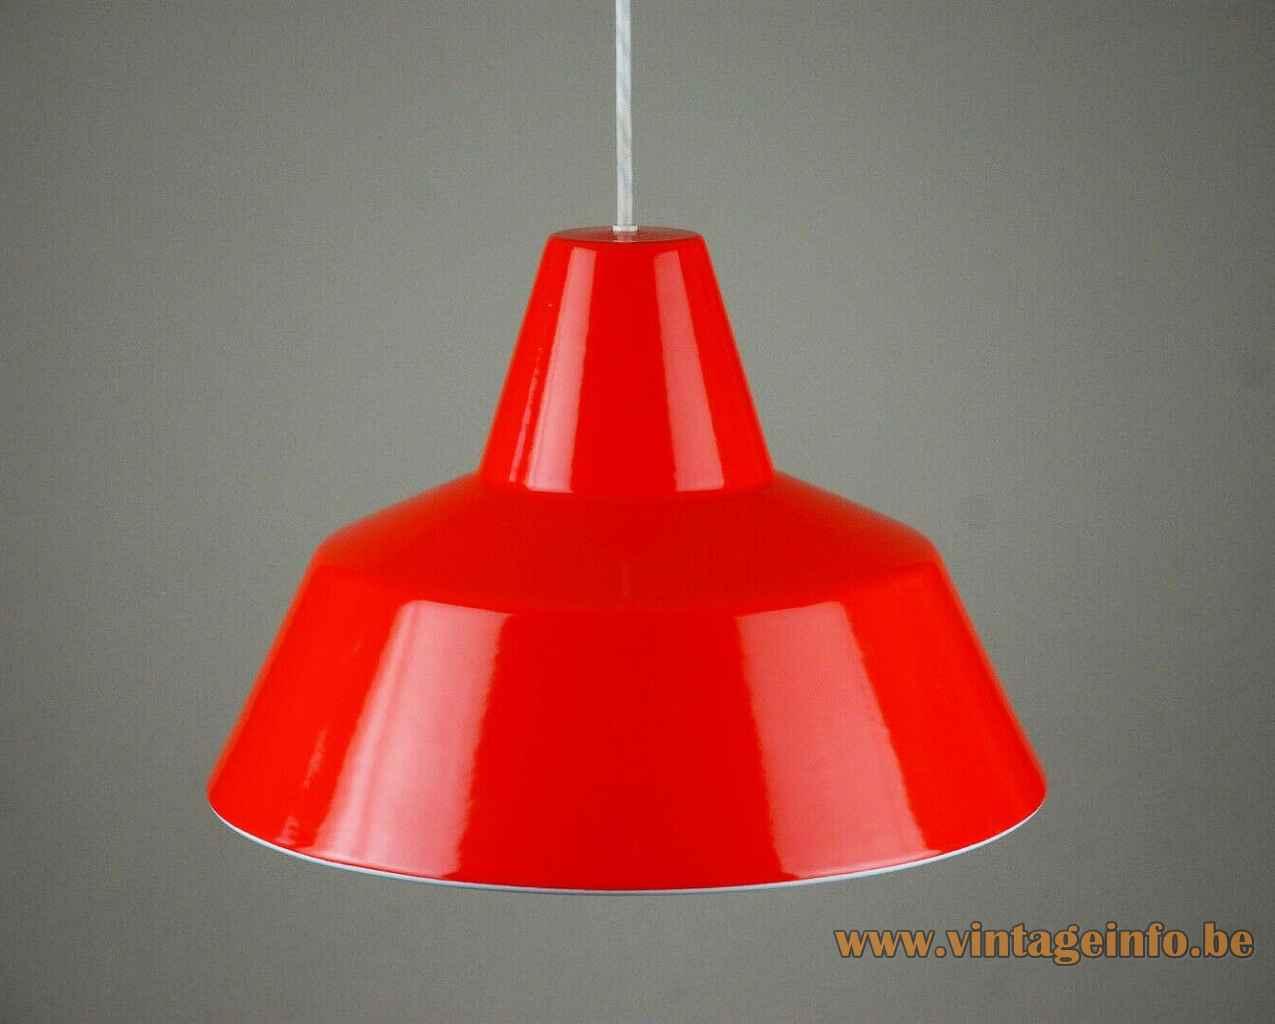 Louis Poulsen Workshop pendant lamp red enamelled industrial metal lampshade 1951 design: Axel Wedel Madsen Denmark